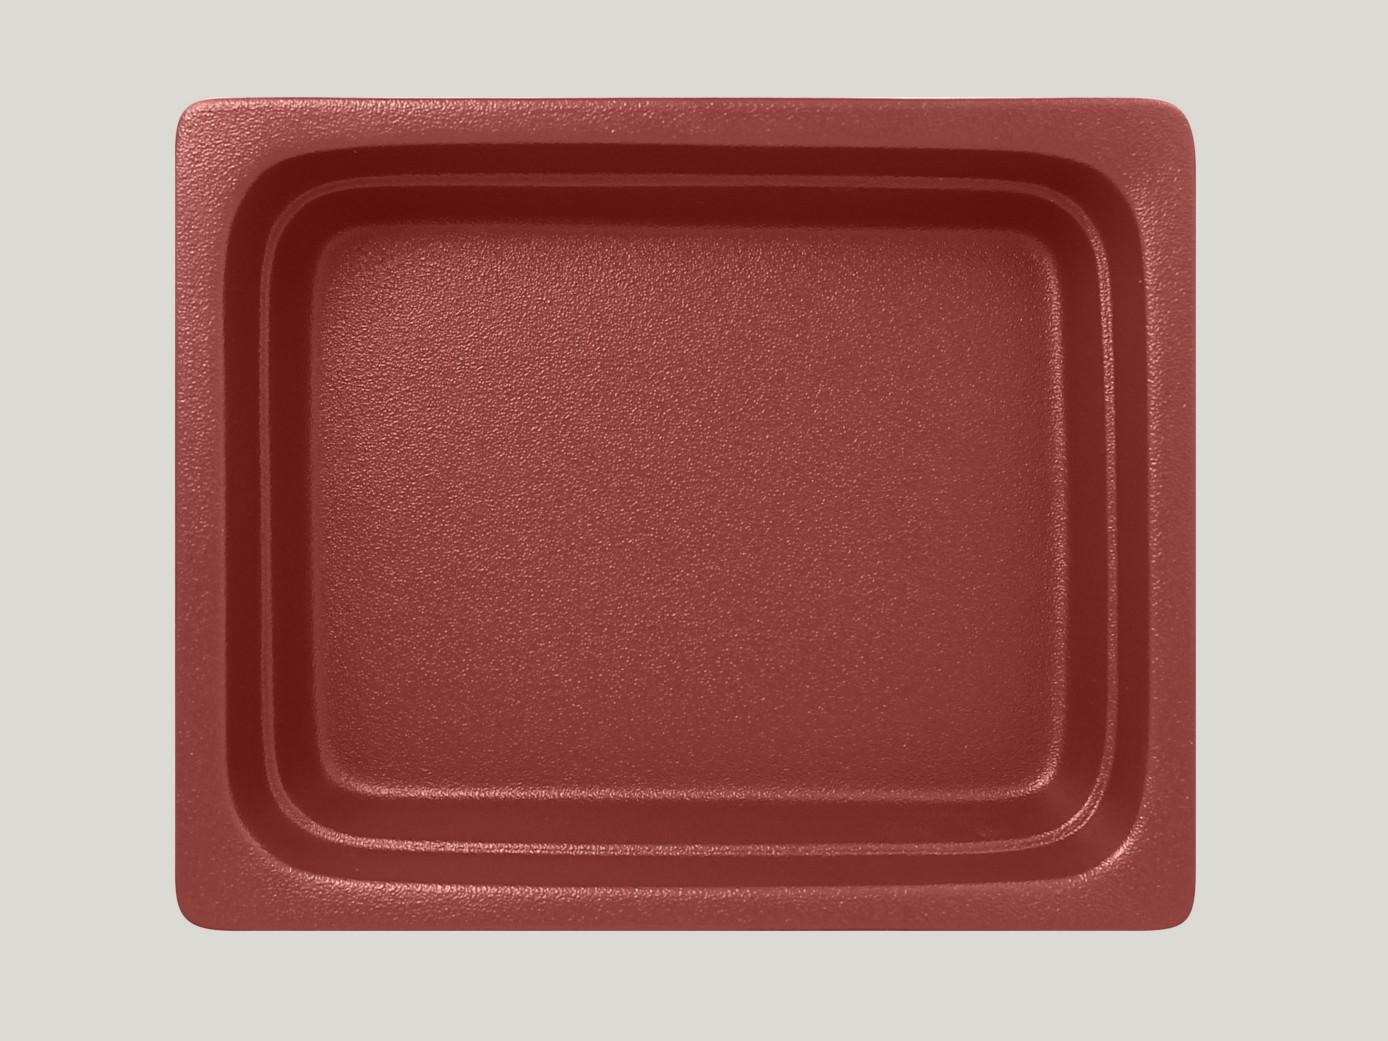 Gastronorm Pánvička 1/2 - tmavě červená Neofusion